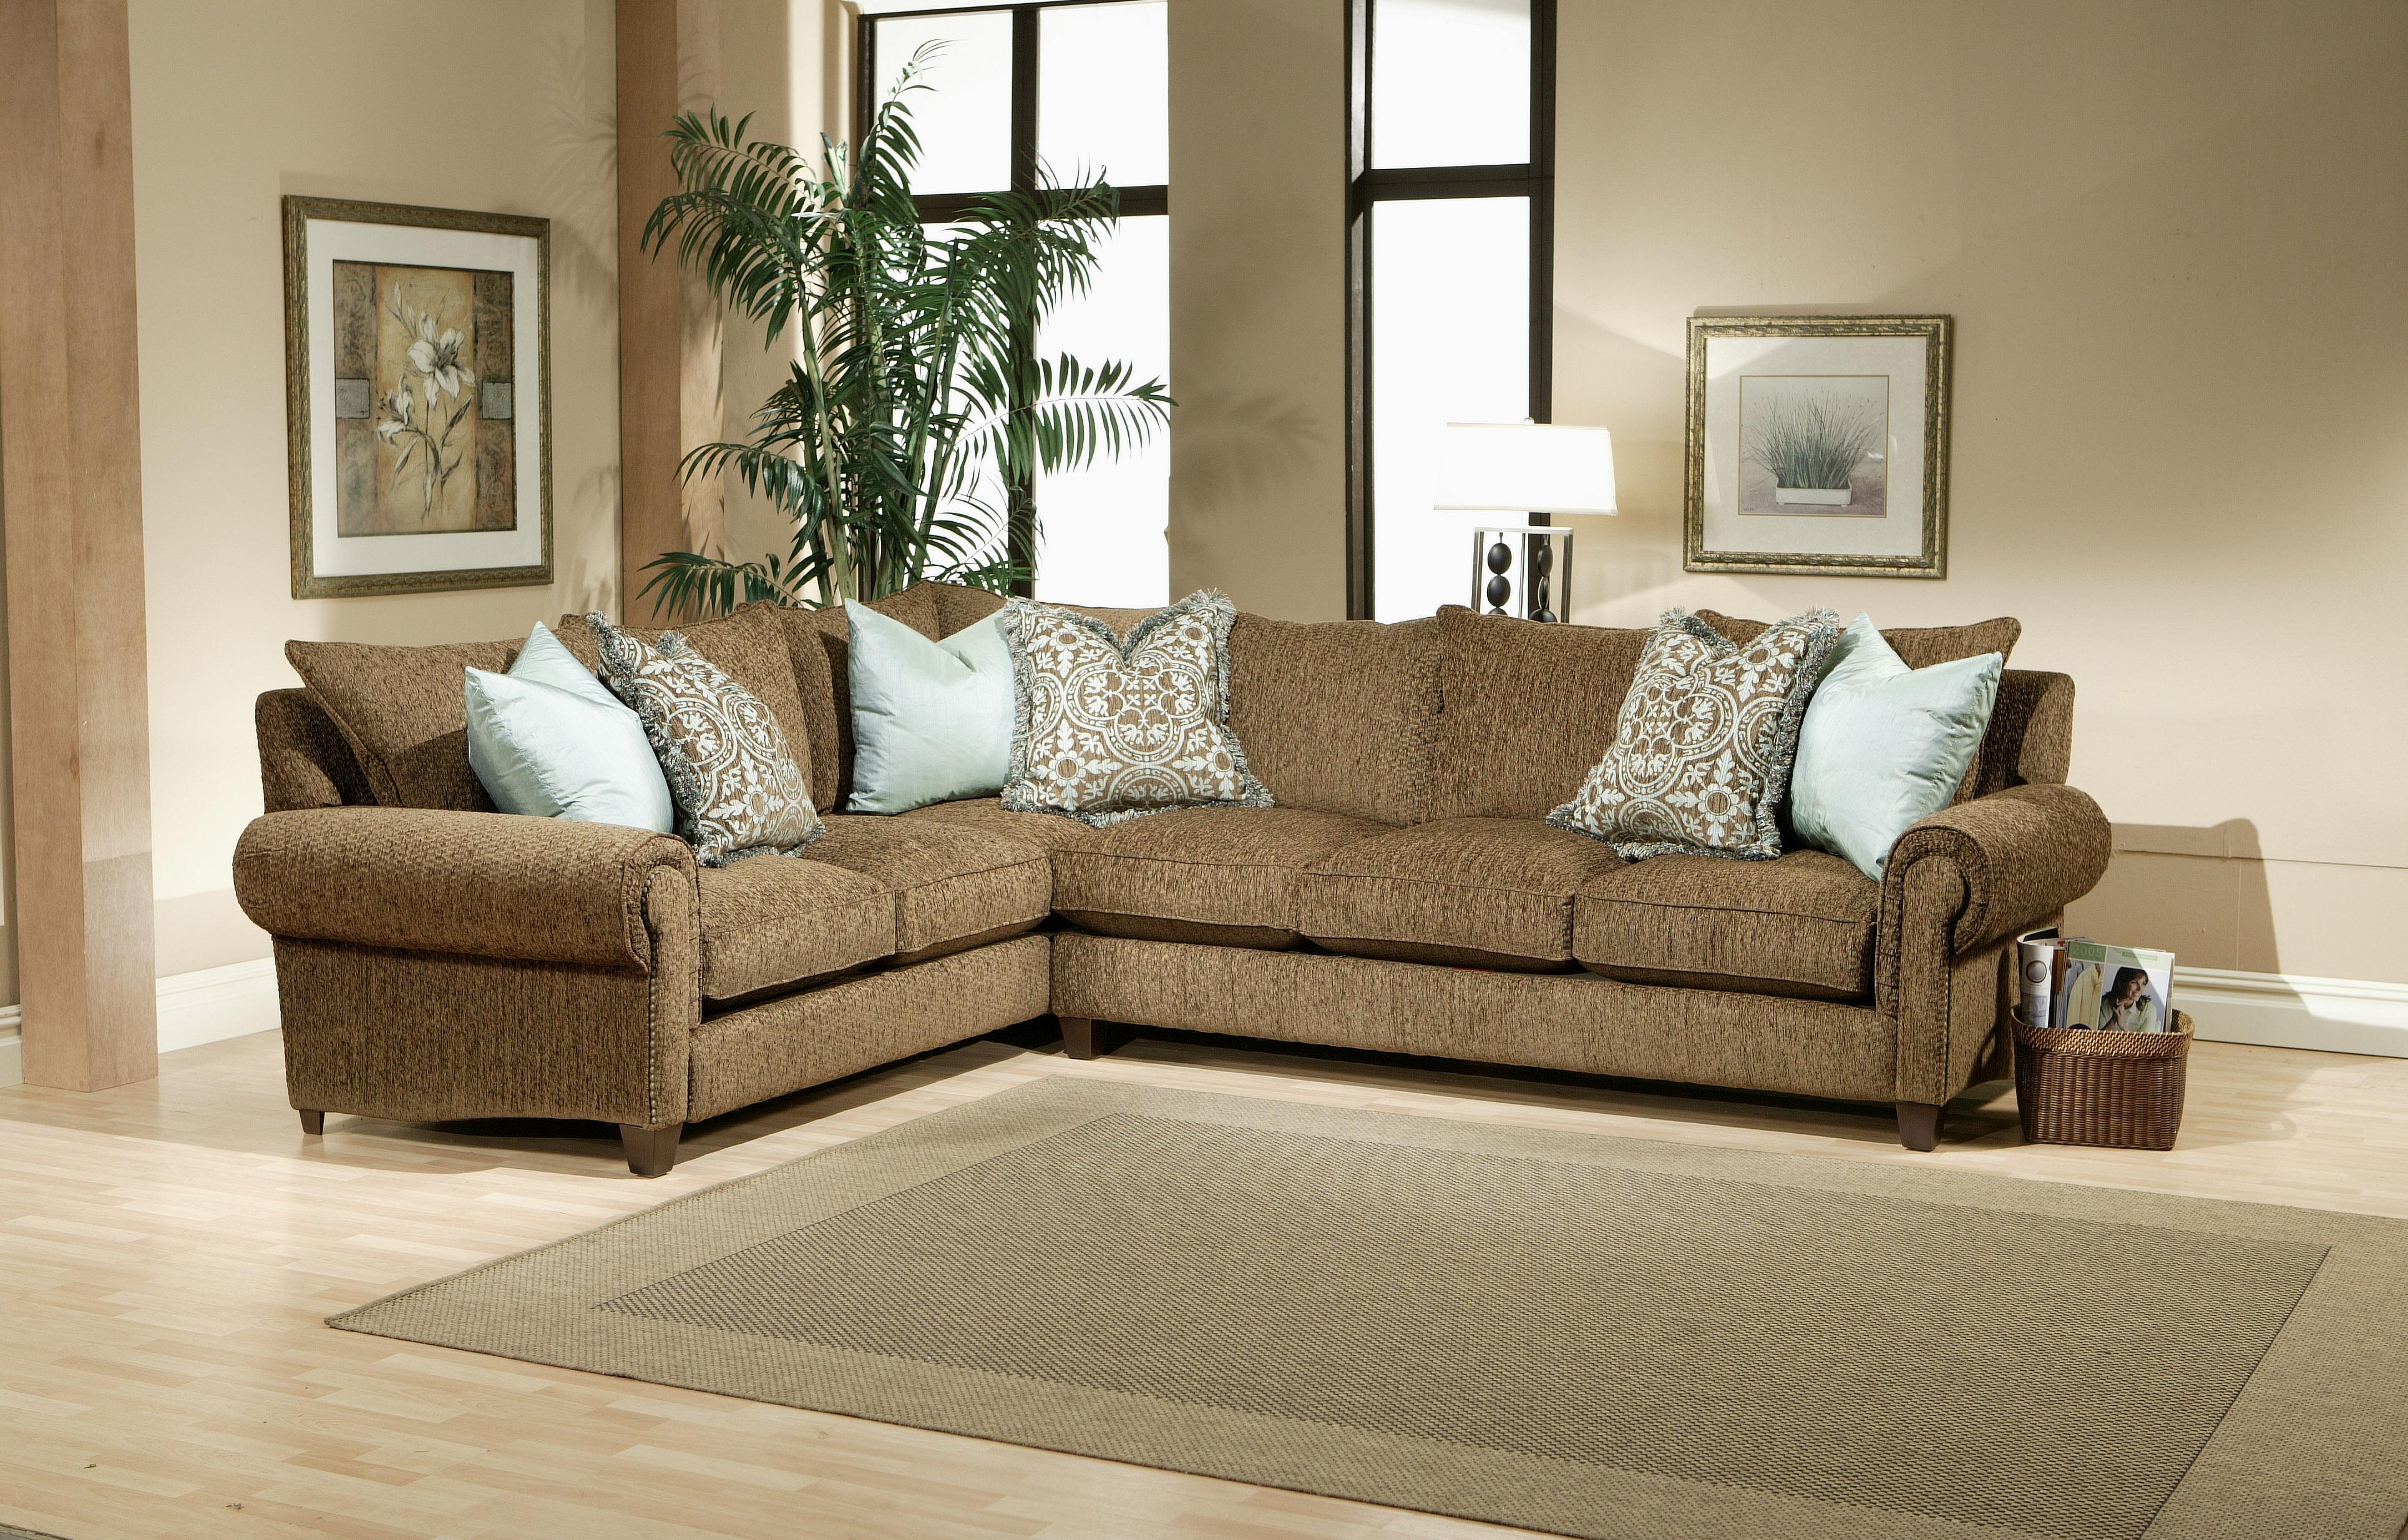 robert michael sectional sofa reviews. Black Bedroom Furniture Sets. Home Design Ideas